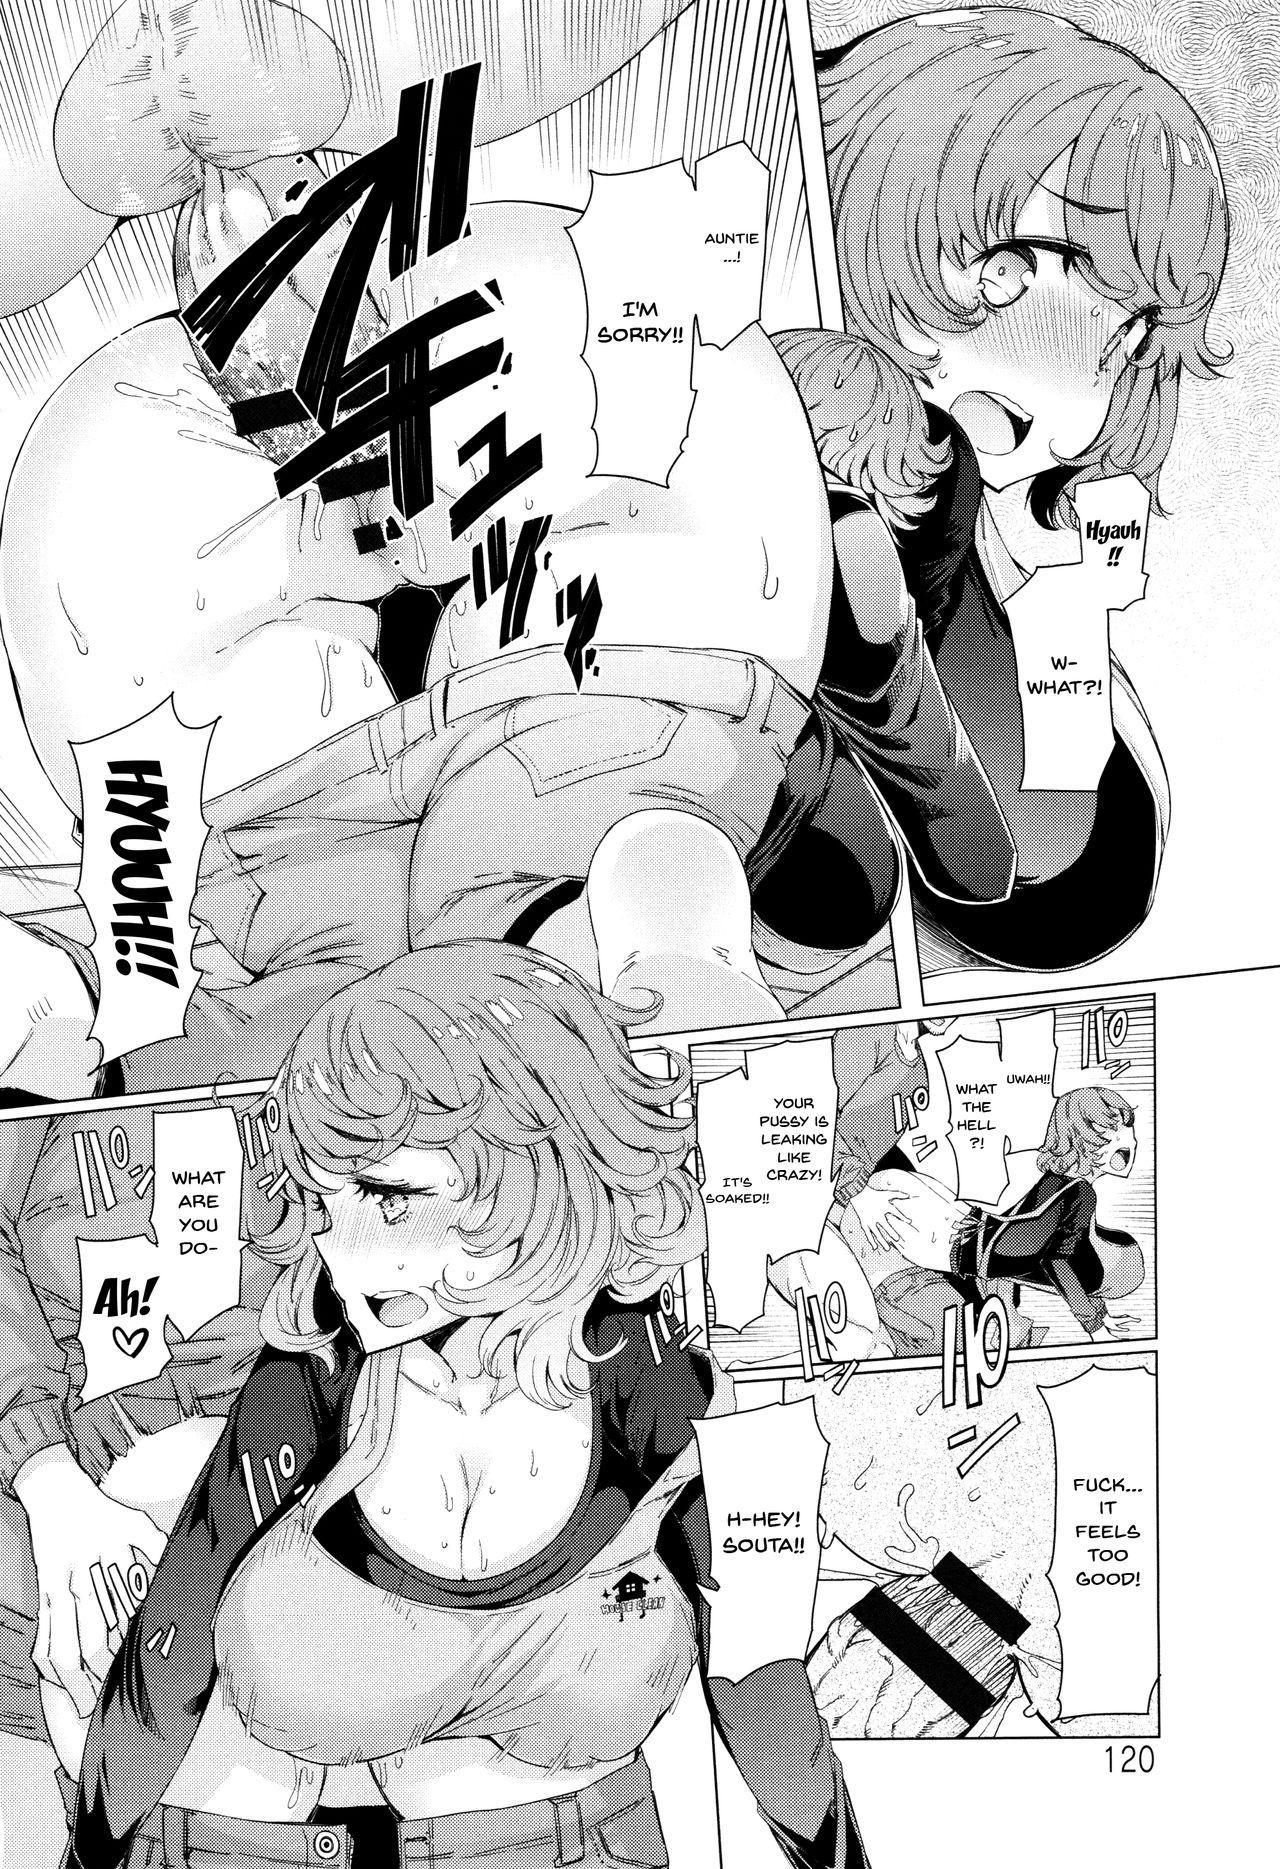 Hitozuma ga Ero Sugite Shigoto ni Naranai! | These Housewives Are Too Lewd I Can't Help It! Ch.1-7 119